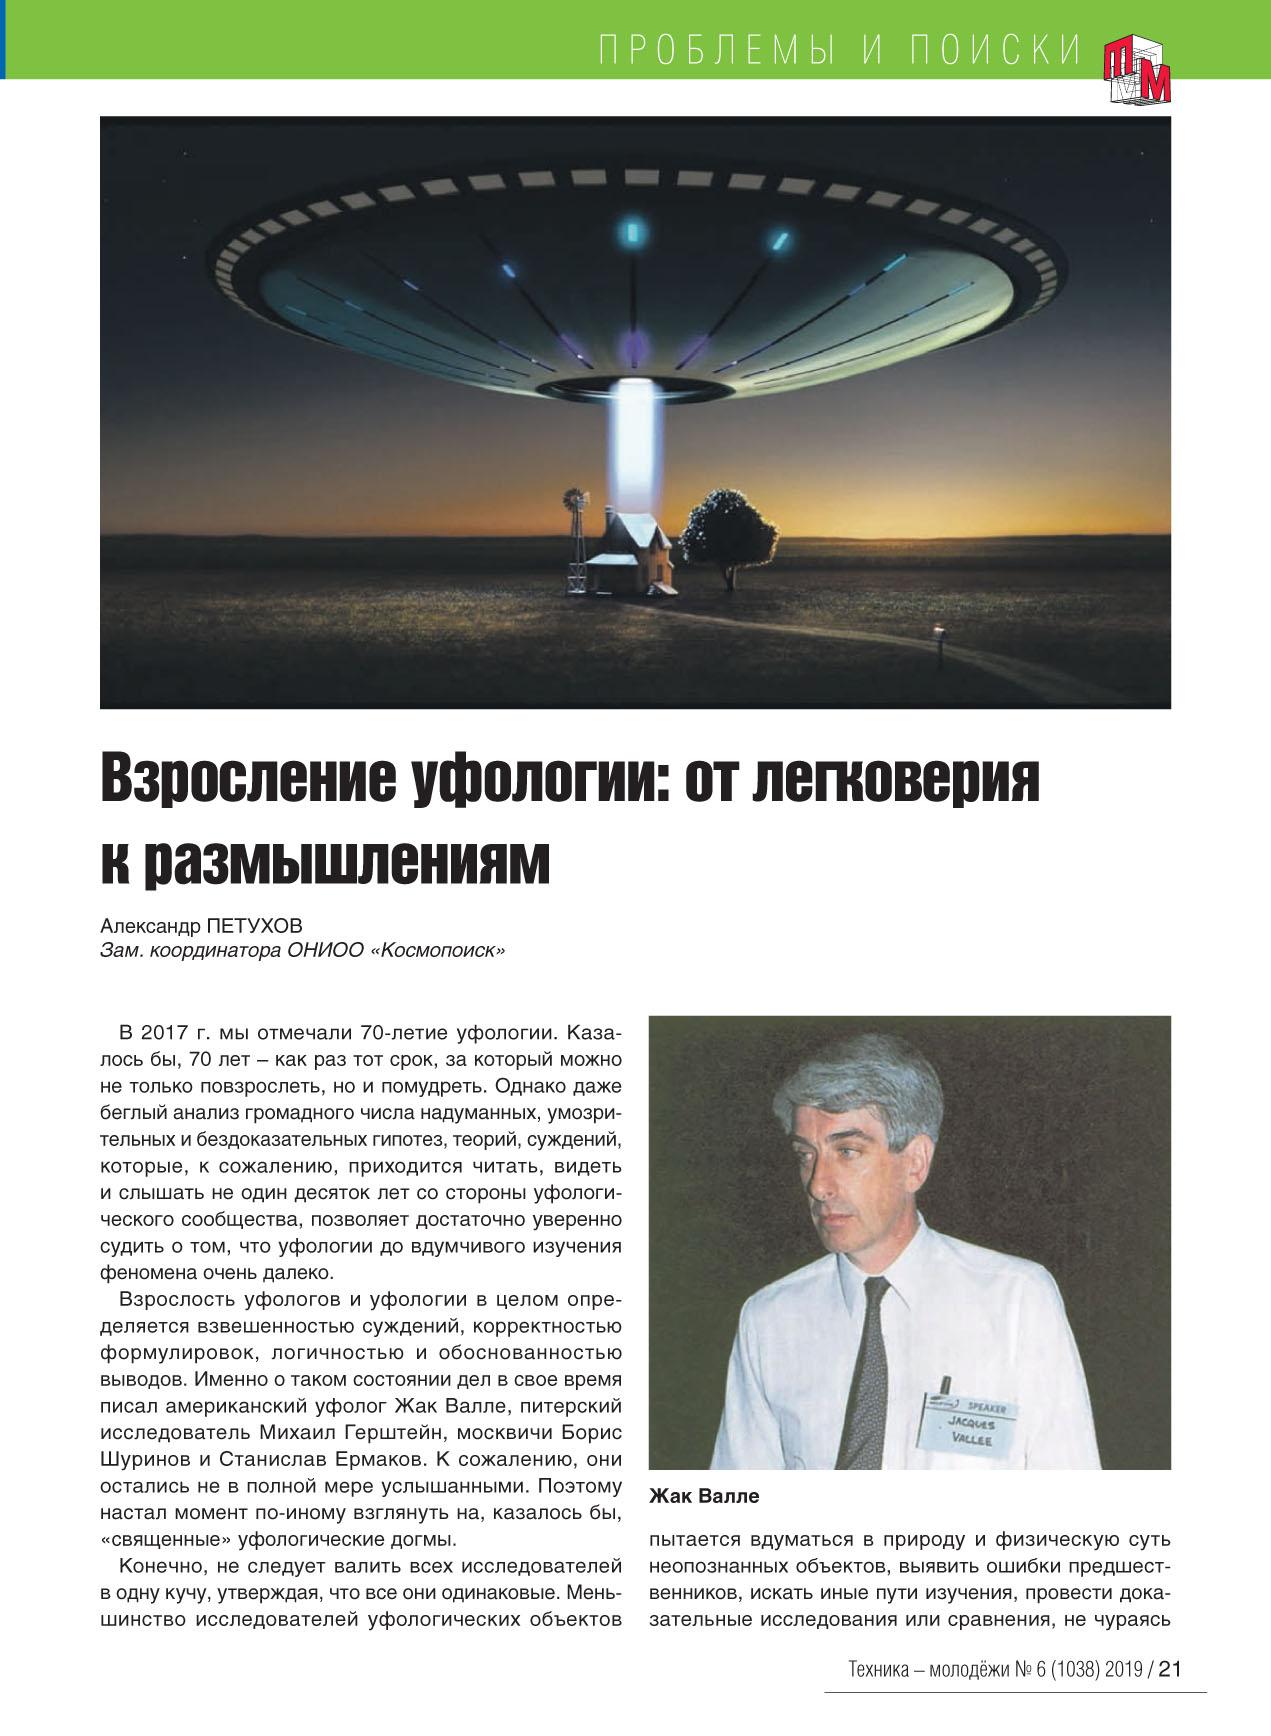 TM 2019-06 UFO 11.jpg